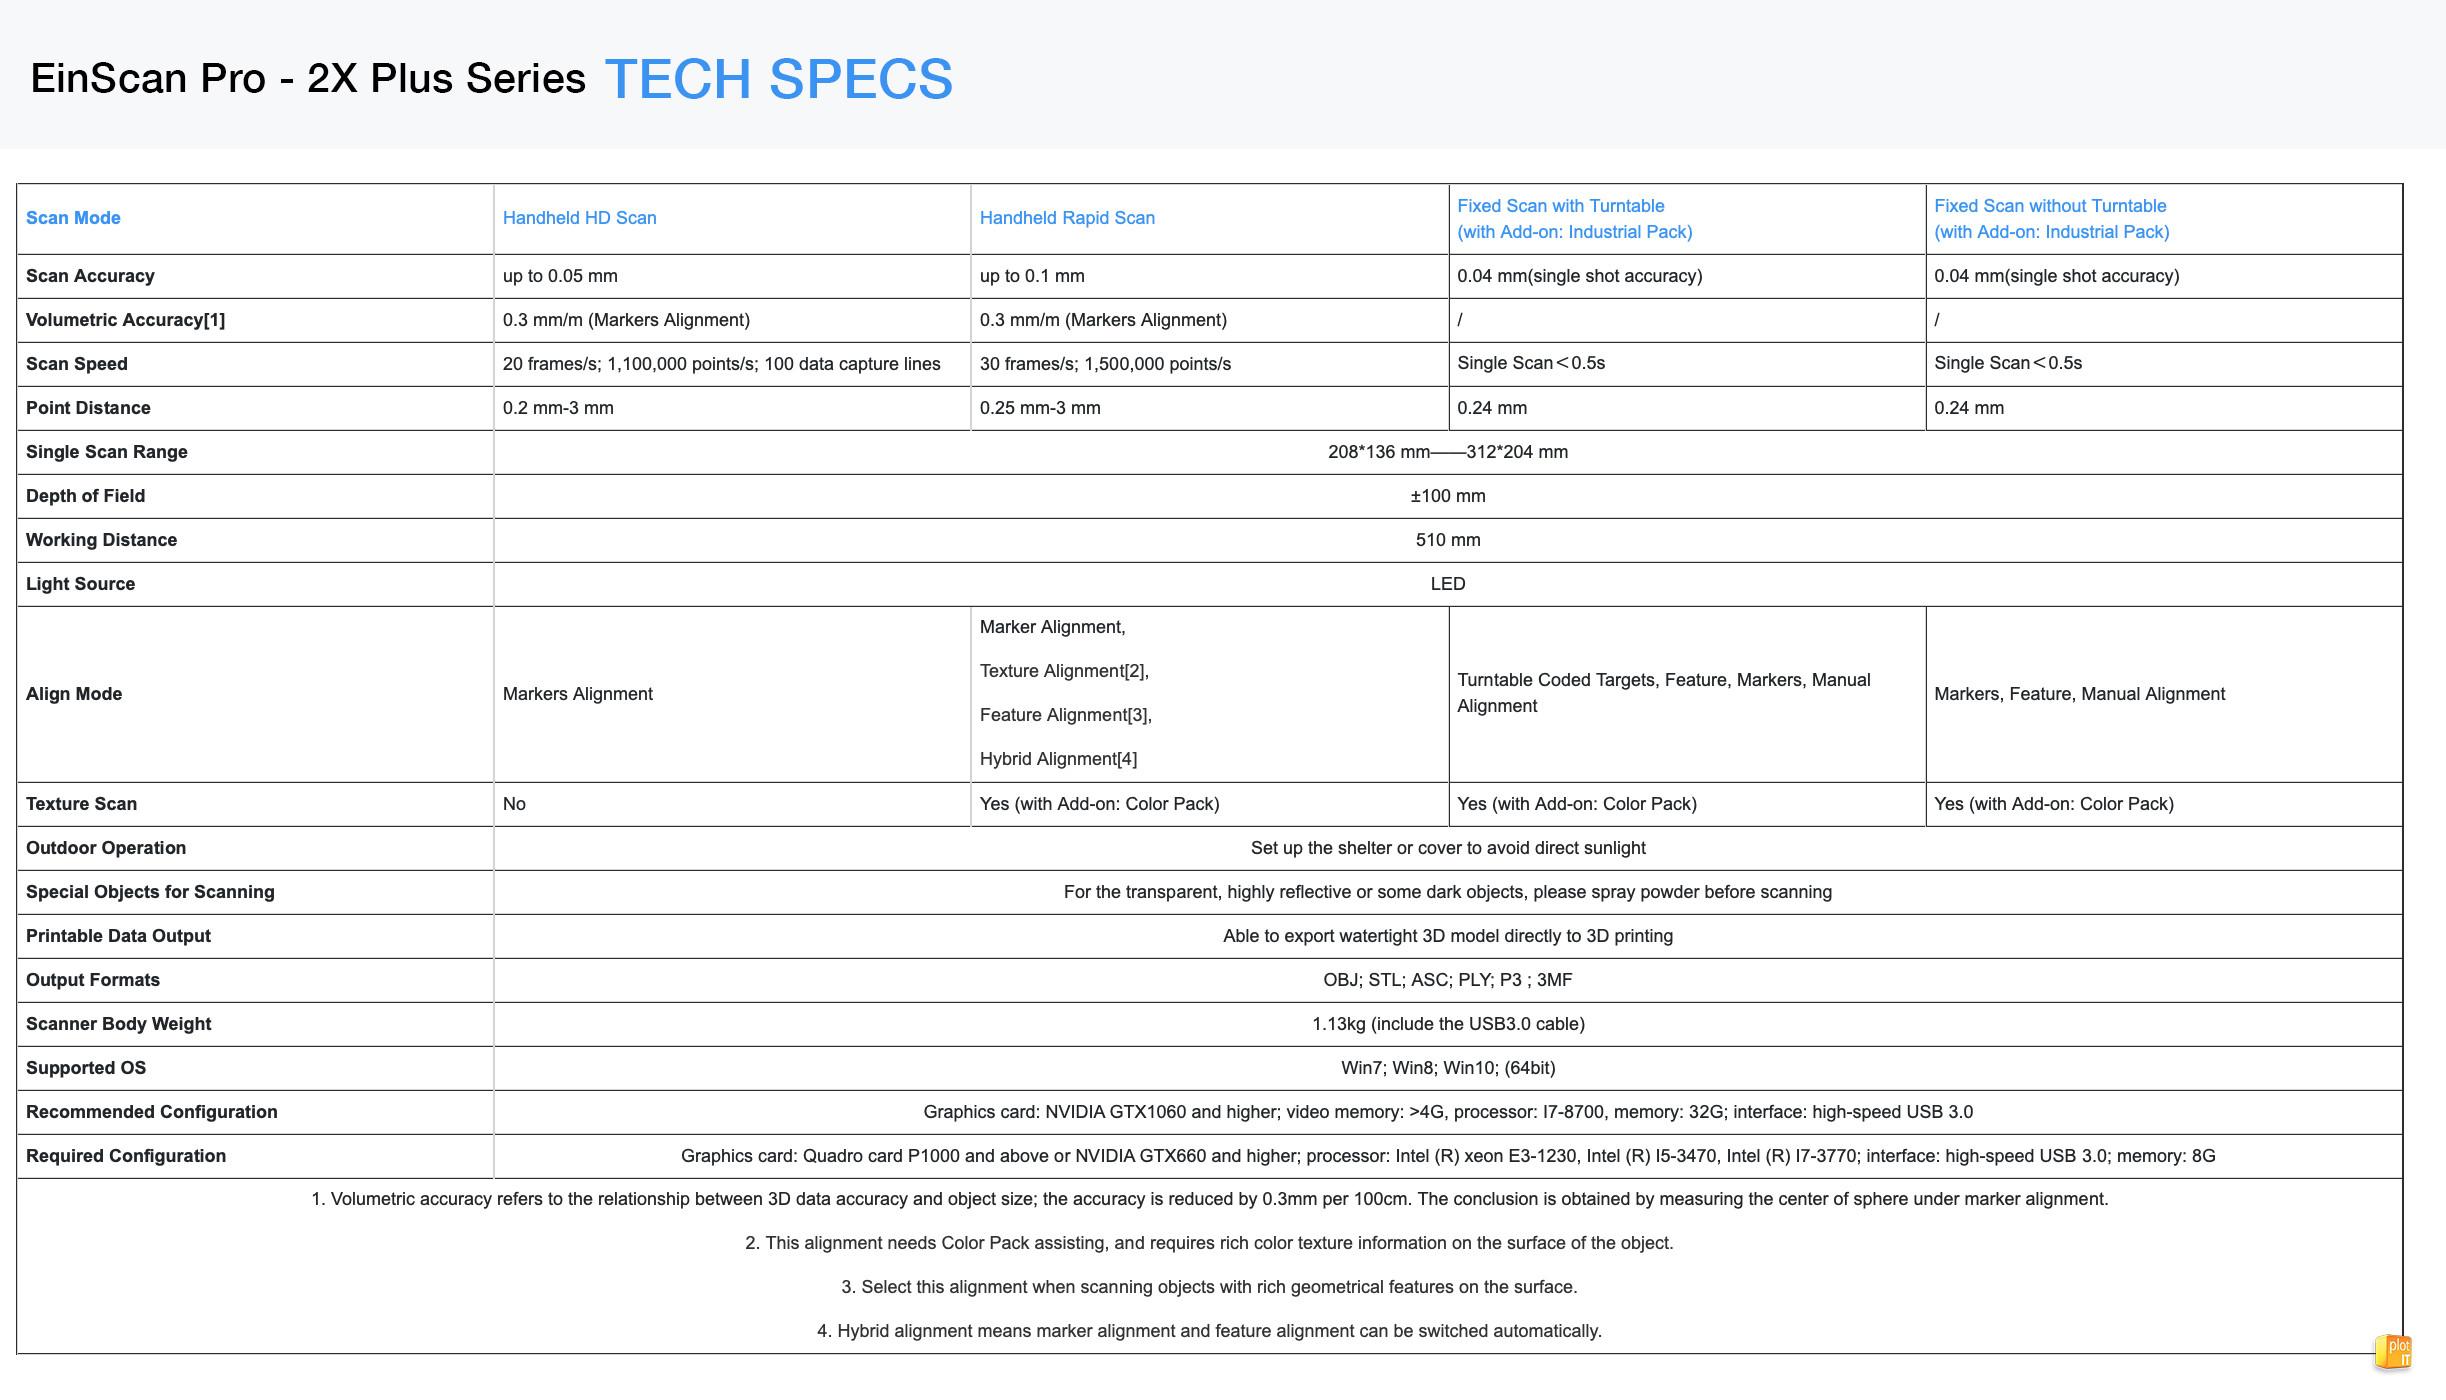 EinScan Pro - 2X Plus Series TECH SPECS